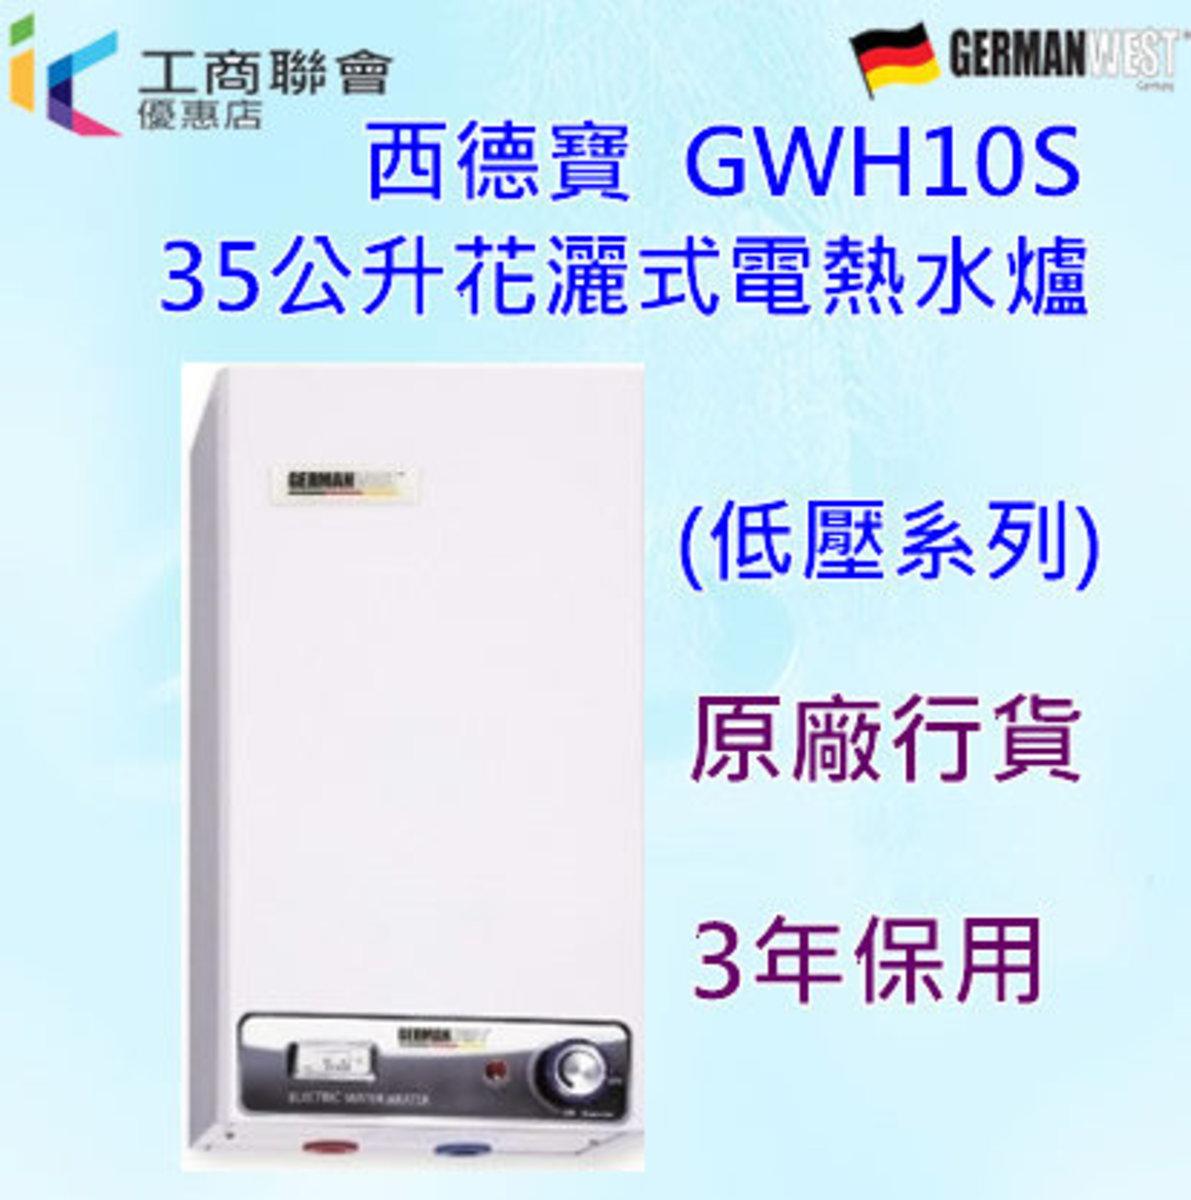 German West GWH10S 35 liters shower type electric water heater